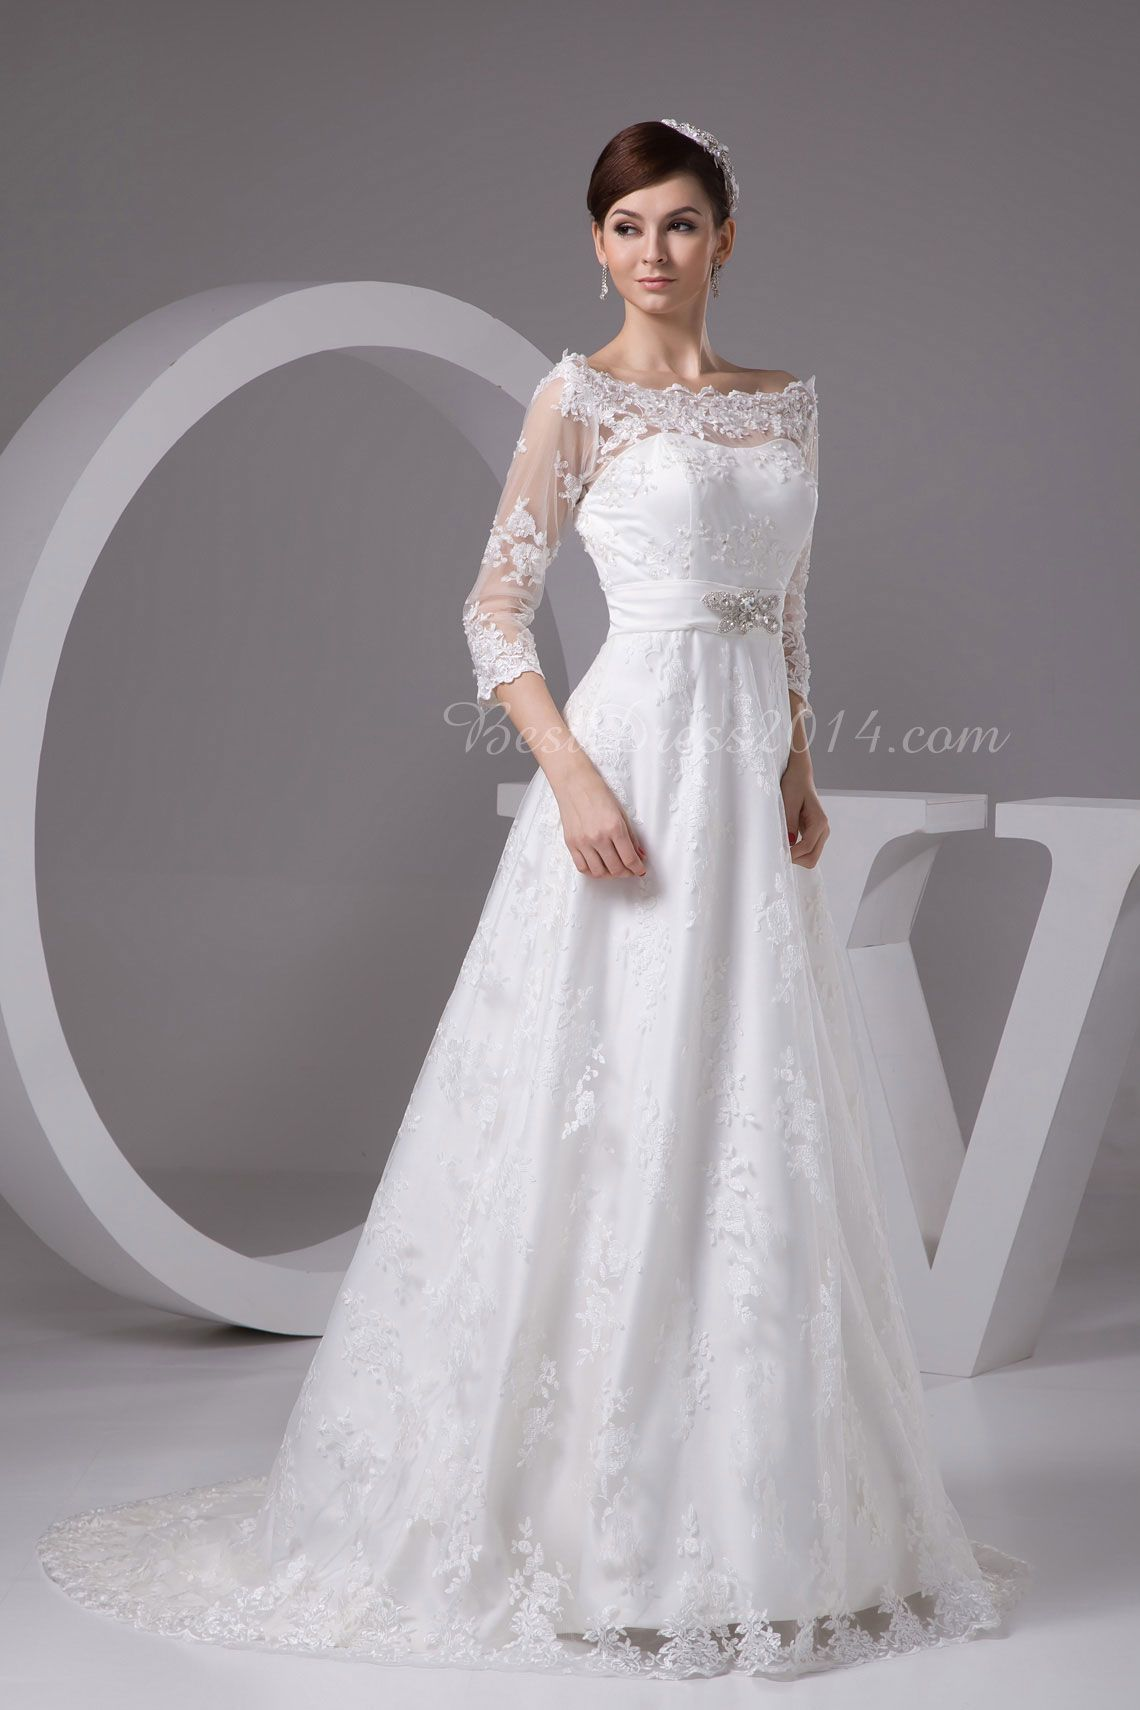 White cocktail dress for wedding  wedding dress wedding dresses  wedding  Pinterest  Wedding dress